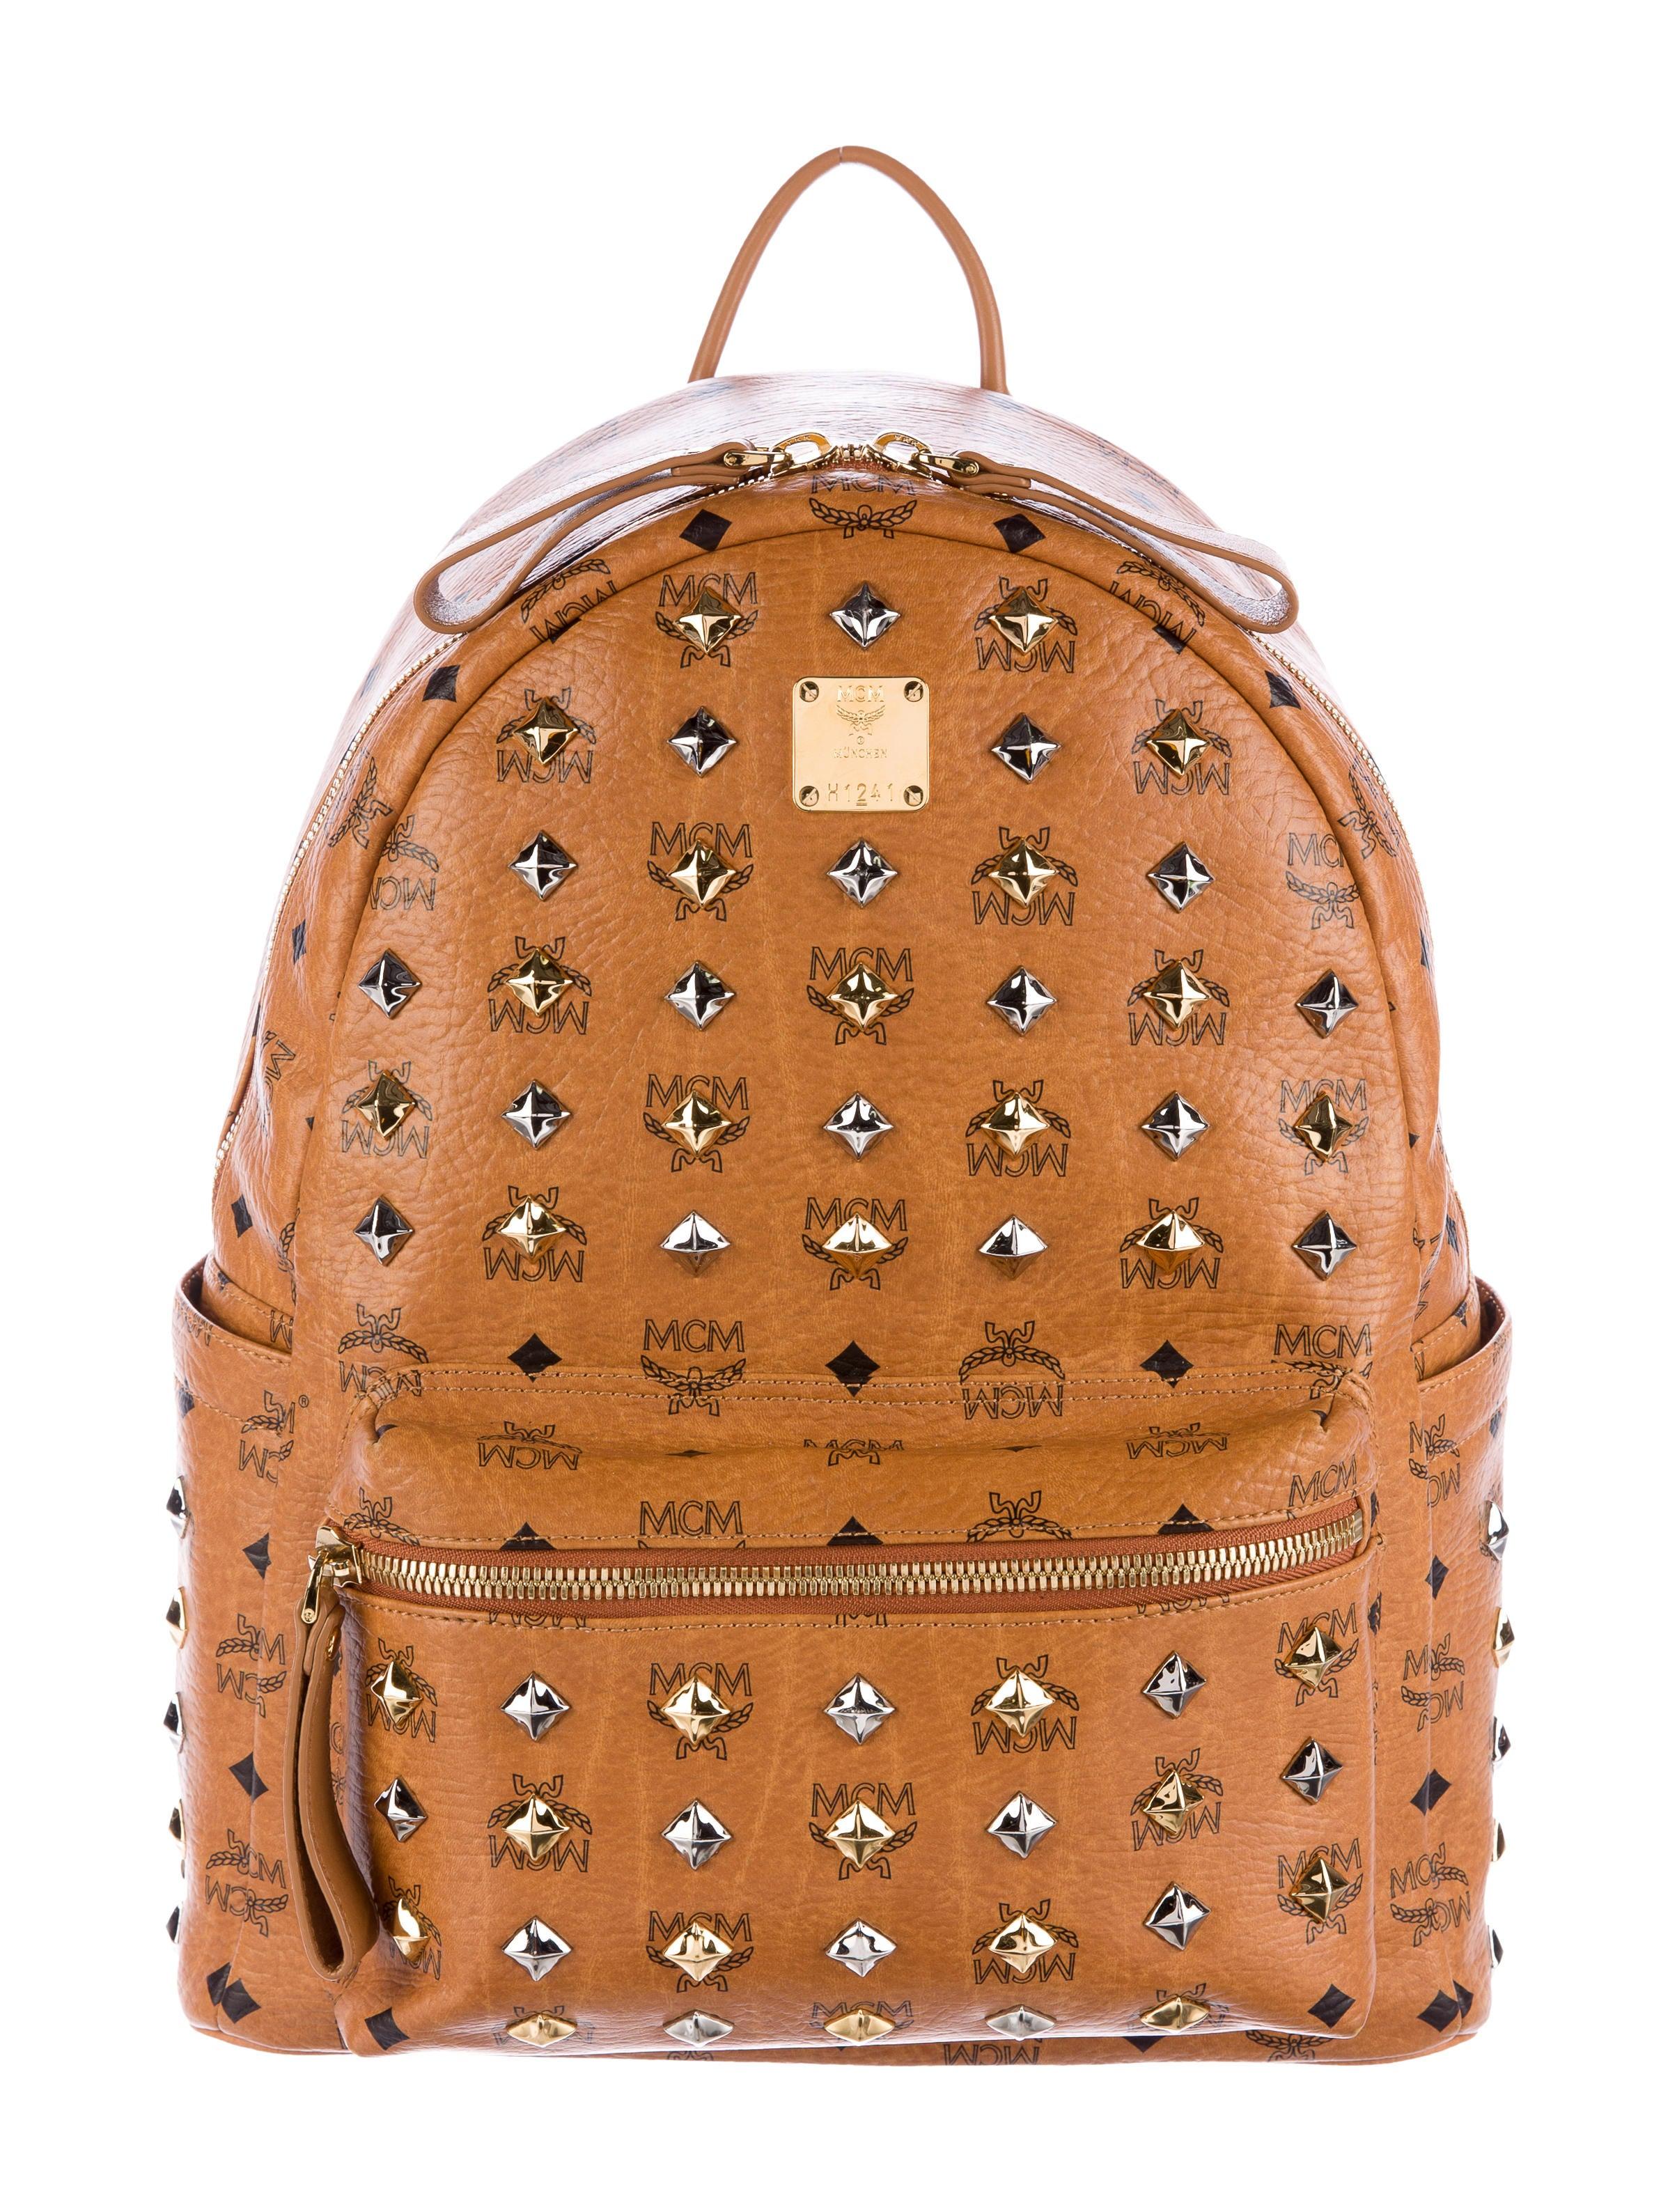 mcm large visetos stark backpack bags w3021194 the realreal. Black Bedroom Furniture Sets. Home Design Ideas